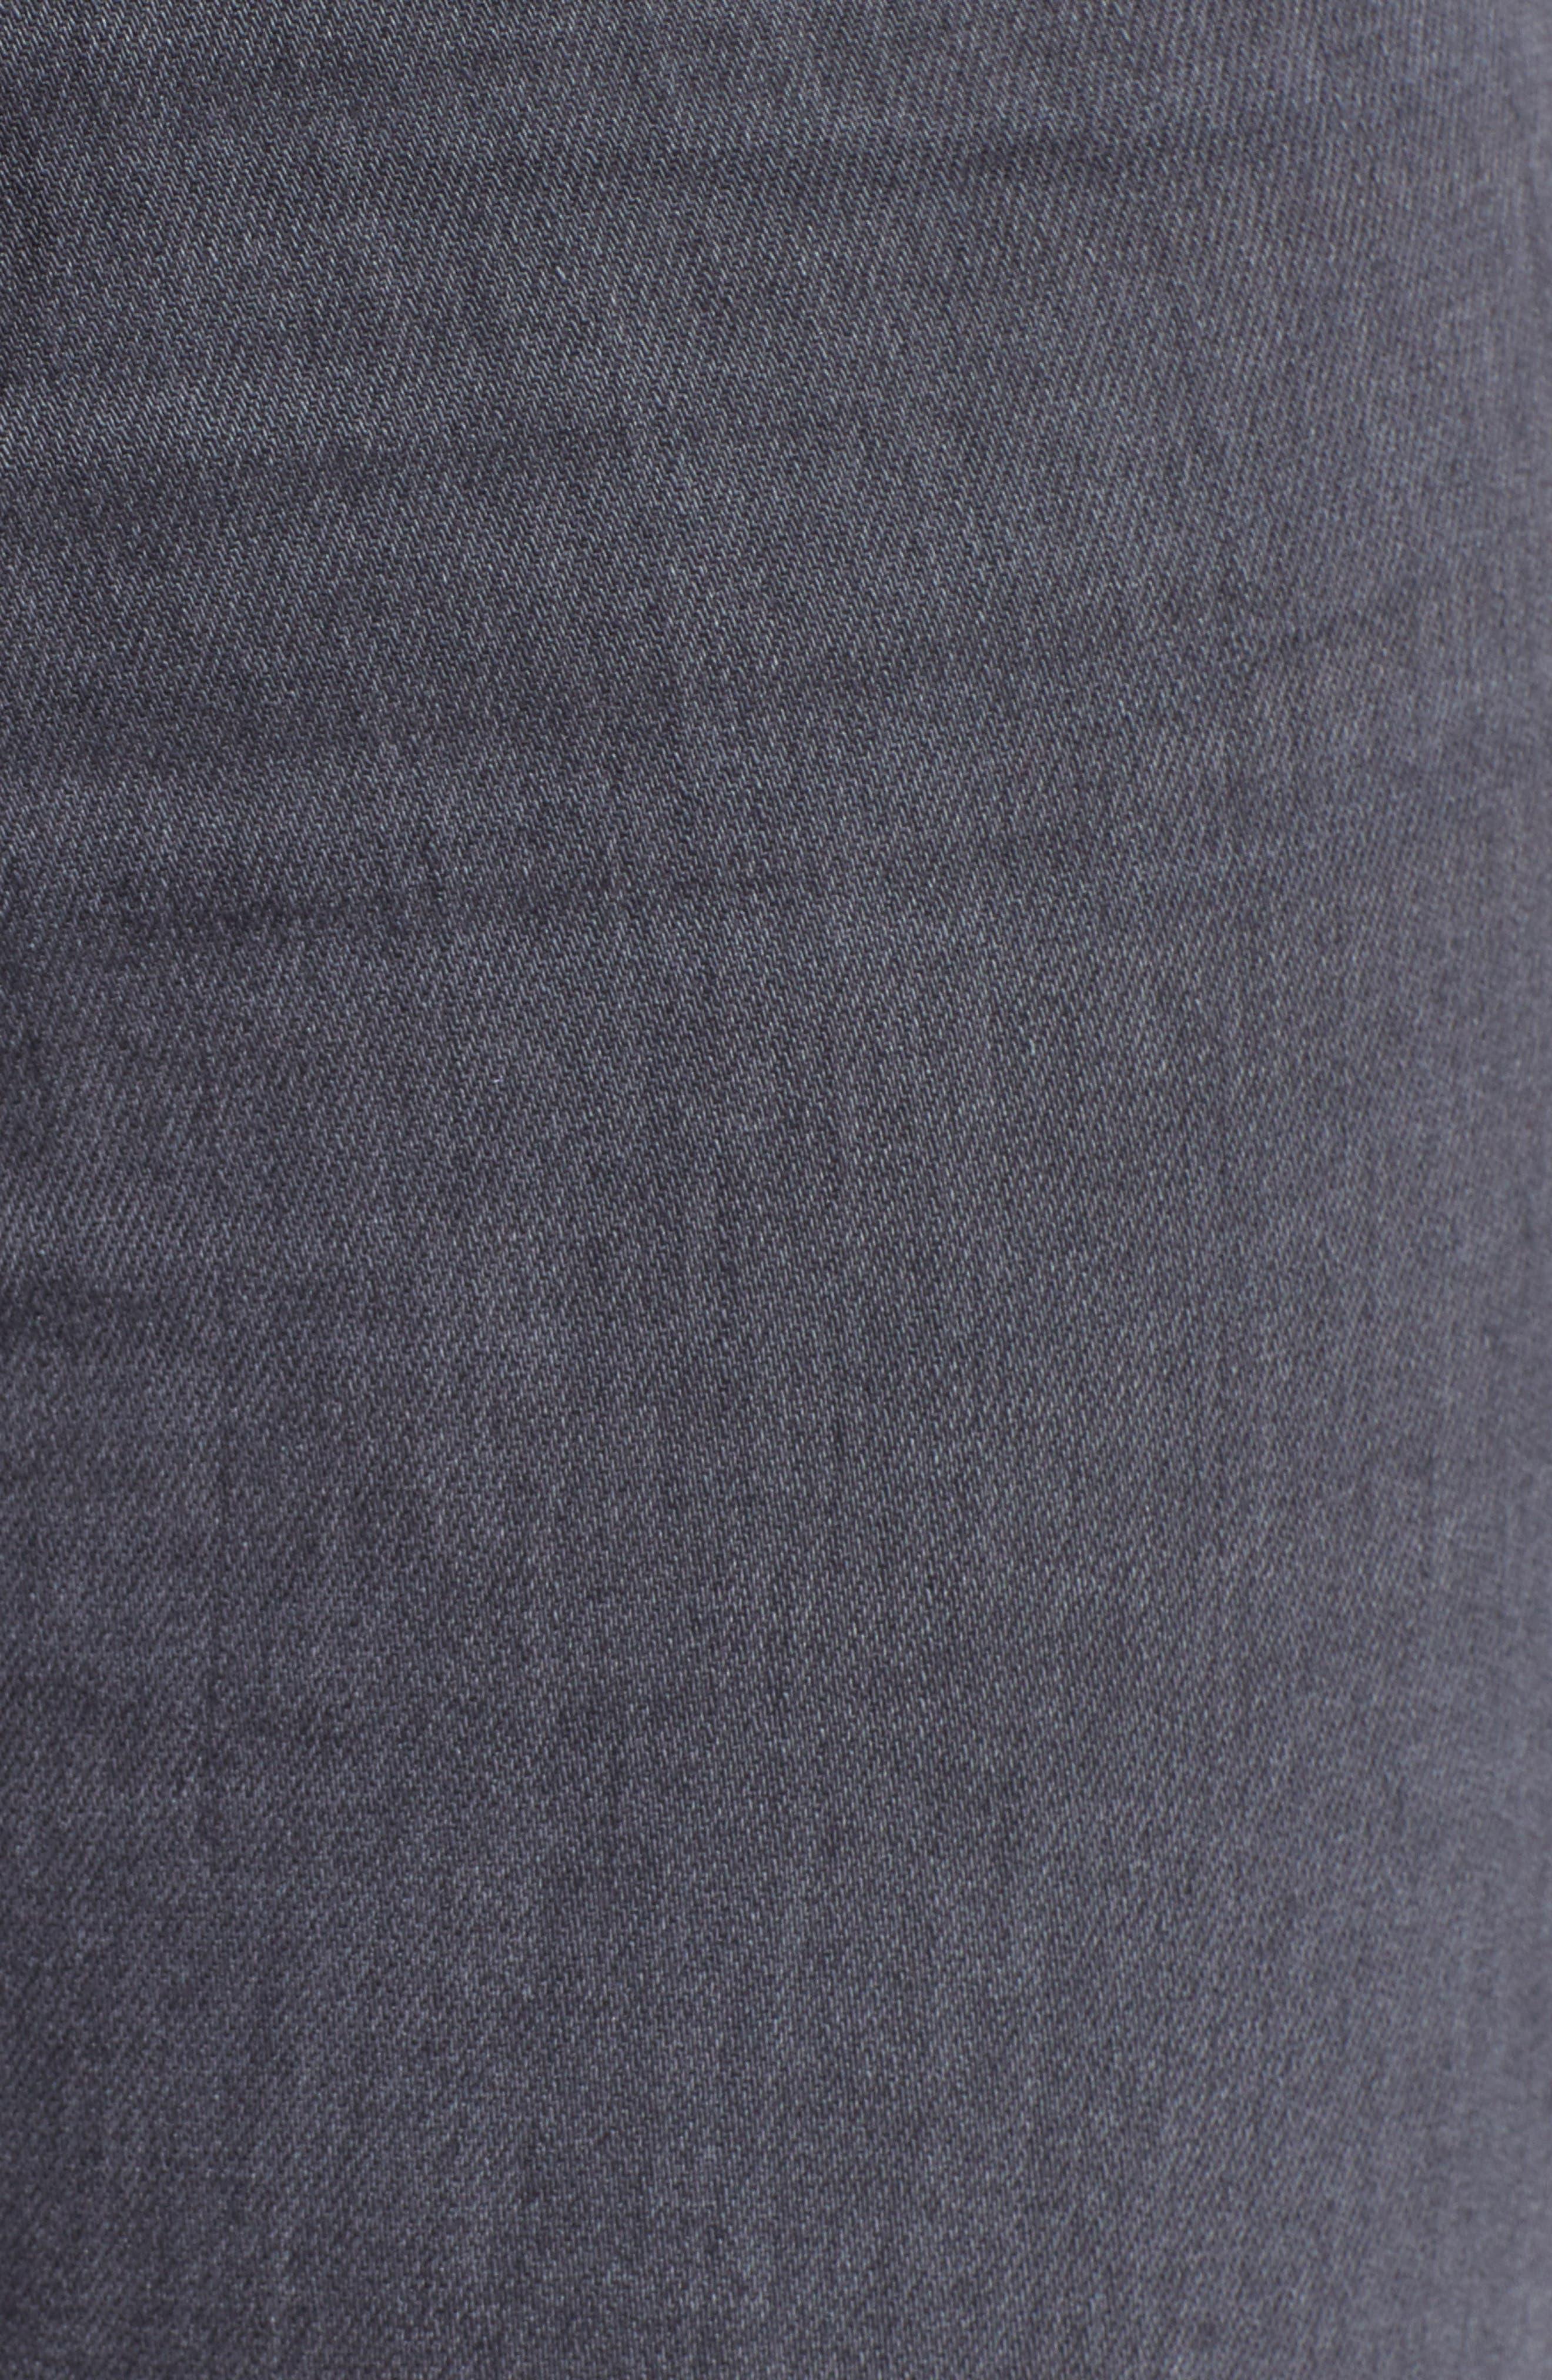 The Farrah High Waist Ankle Skinny Faux Leather Pants,                             Alternate thumbnail 16, color,